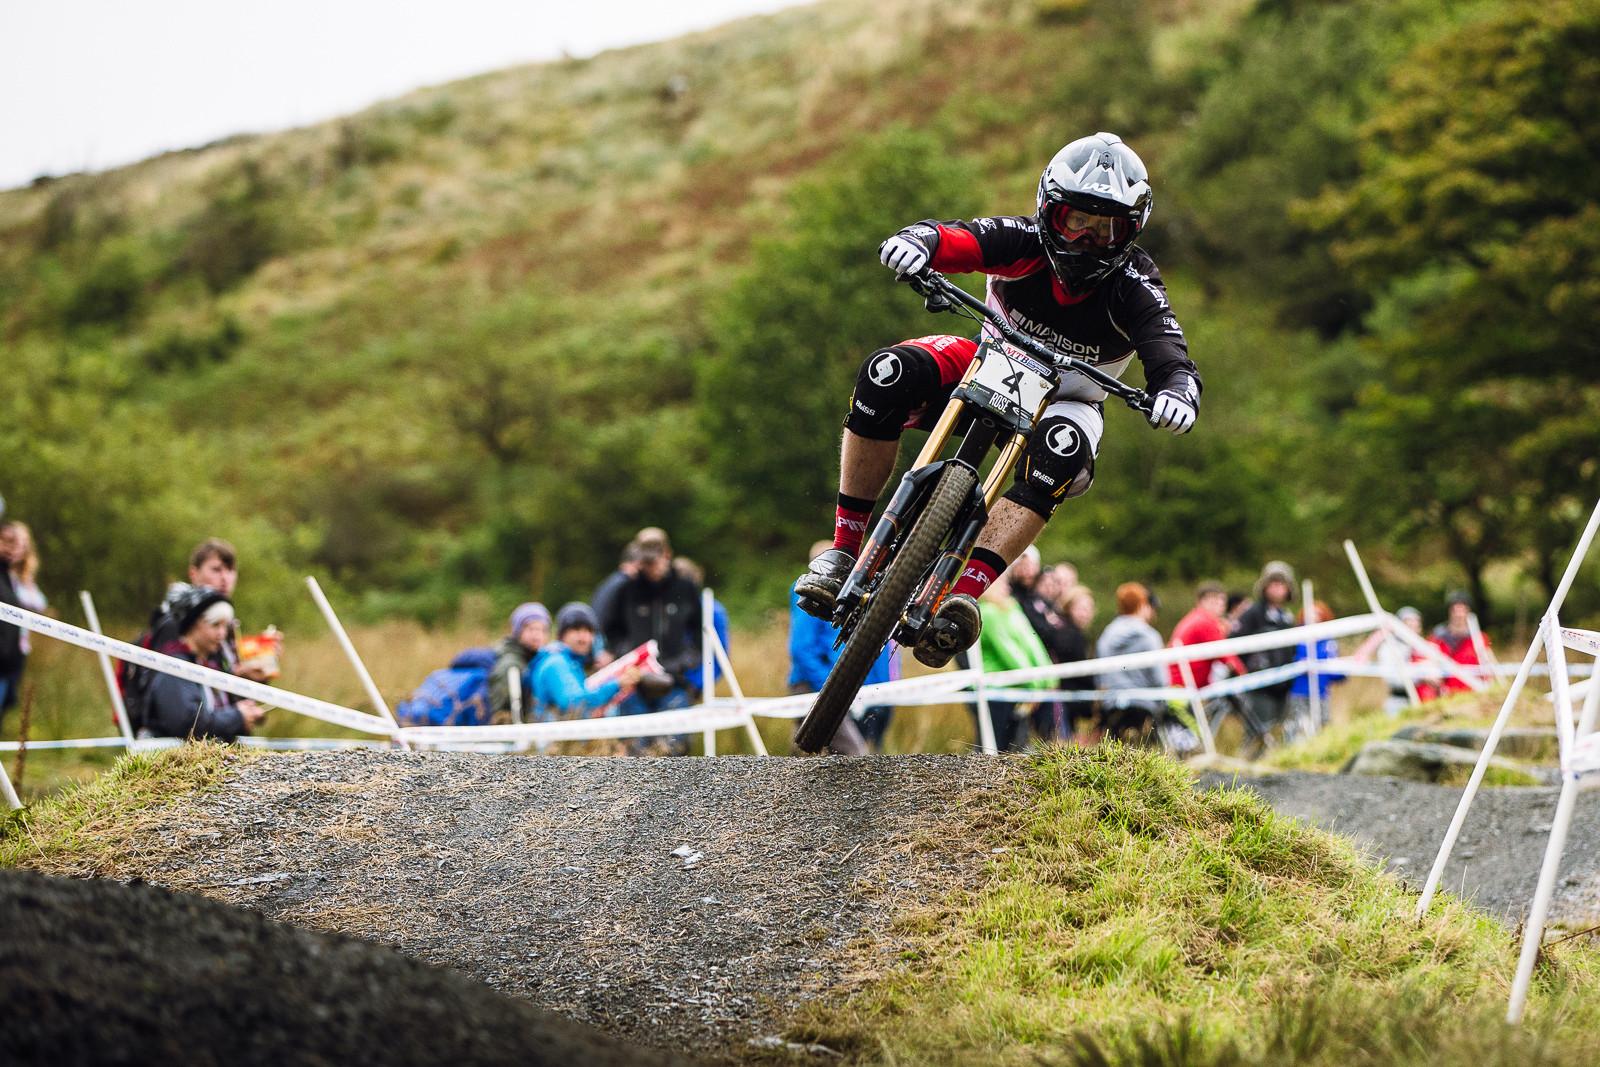 Matt Simmonds, Winner of the 2015 British Downhill Series Finals, Antur Stiniog - 2015 British Downhill Series Finals - Mountain Biking Pictures - Vital MTB